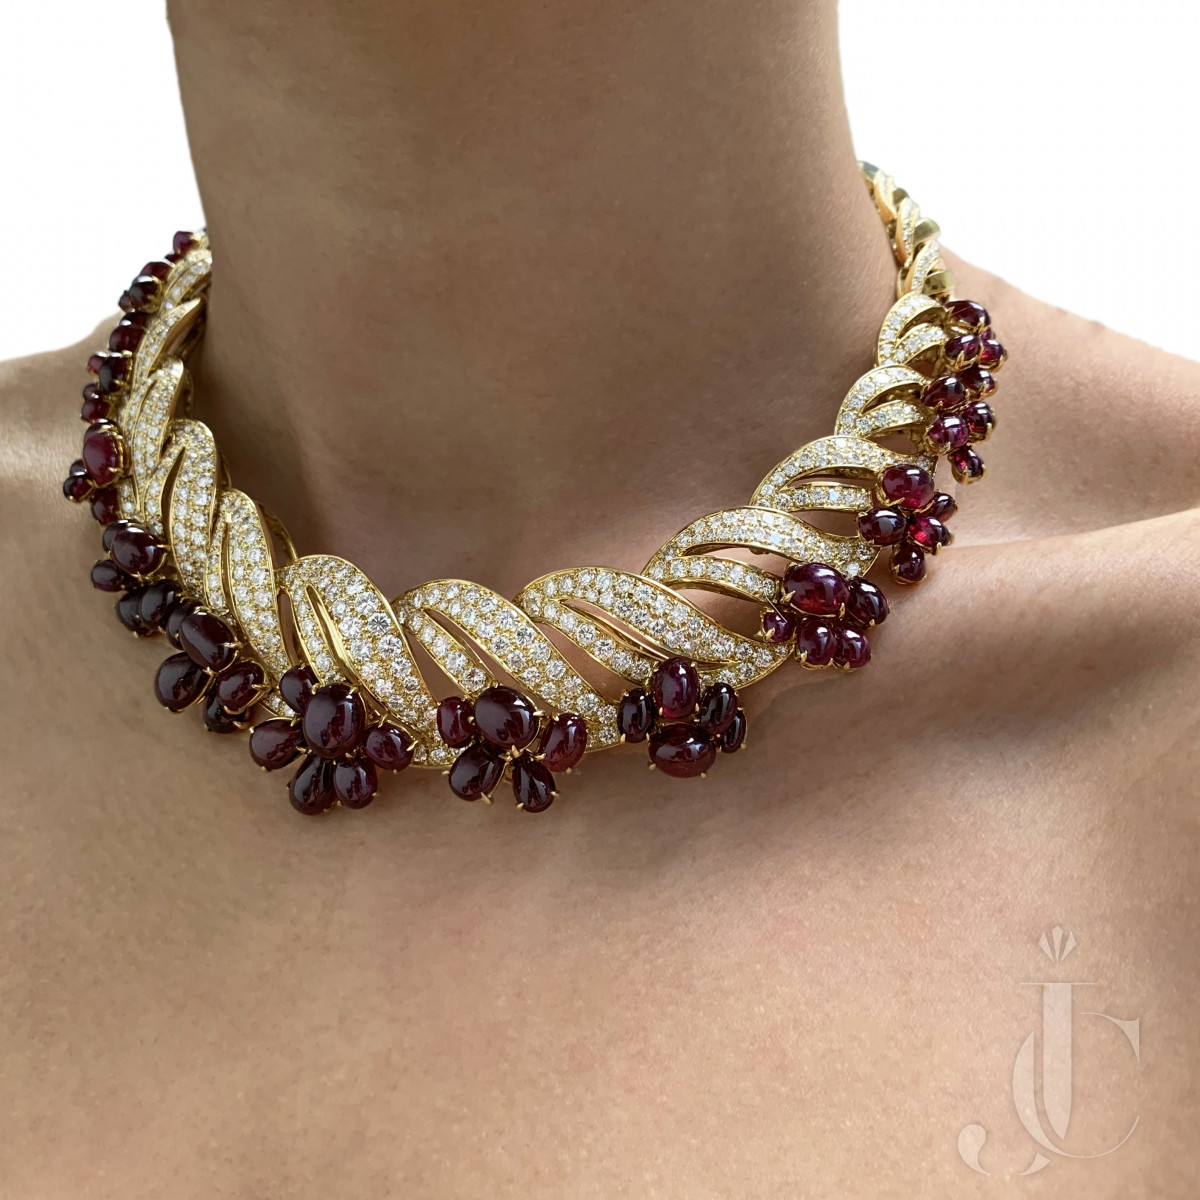 Adler Ruby Diamond Necklace